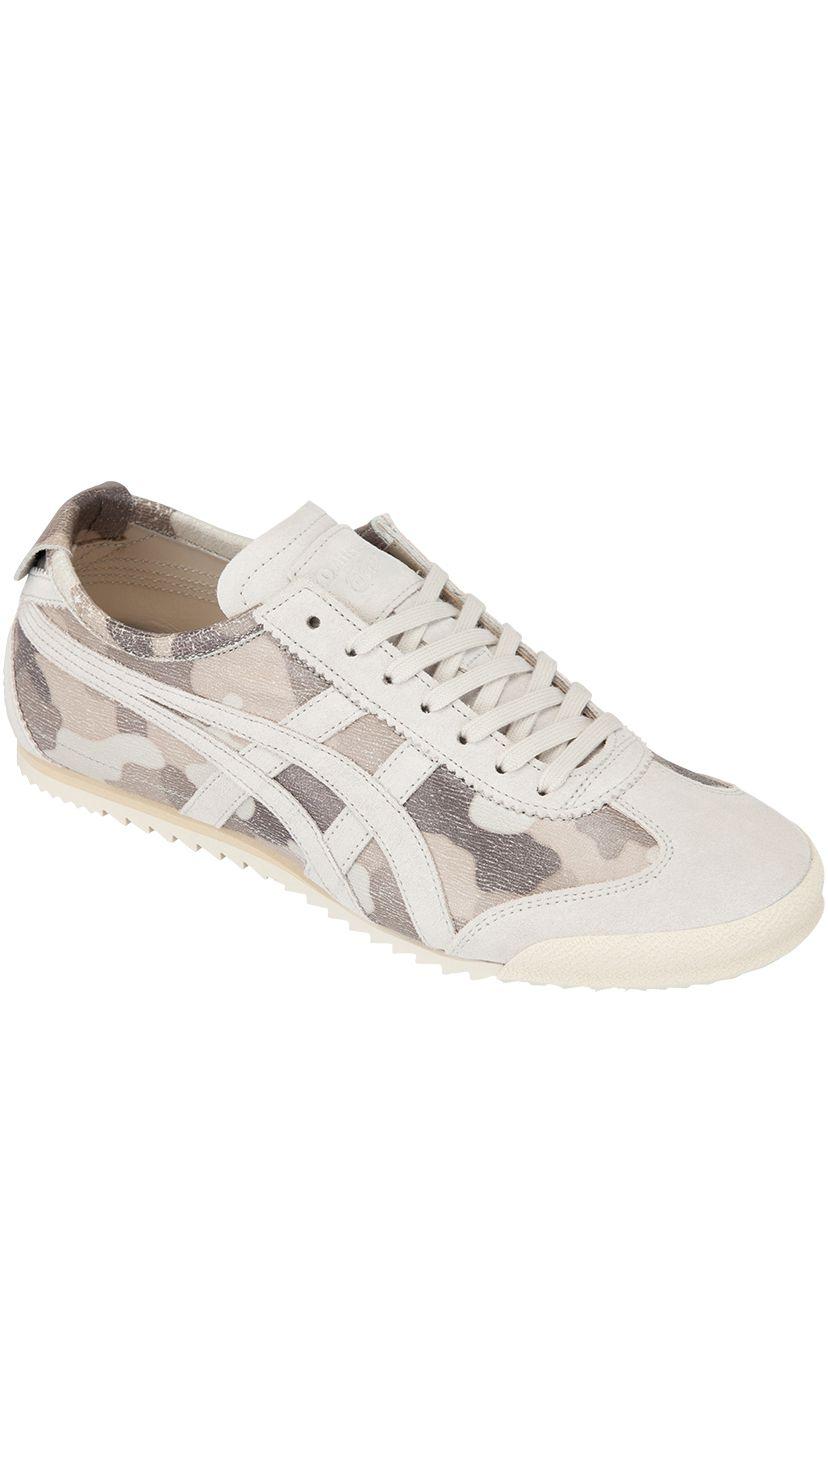 """NIPPON MADE""系列8月發售的新款""MEXICO SLIP-ON DELUXE""中的一款。懶人鞋設計,方便穿脫。鞋面內藏彈力鬆緊帶,讓鞋子更合腳。鞋幫採用日本製皮革,配有迷彩圖案。 WHITE/WHITE 25,920日圓(含稅)"